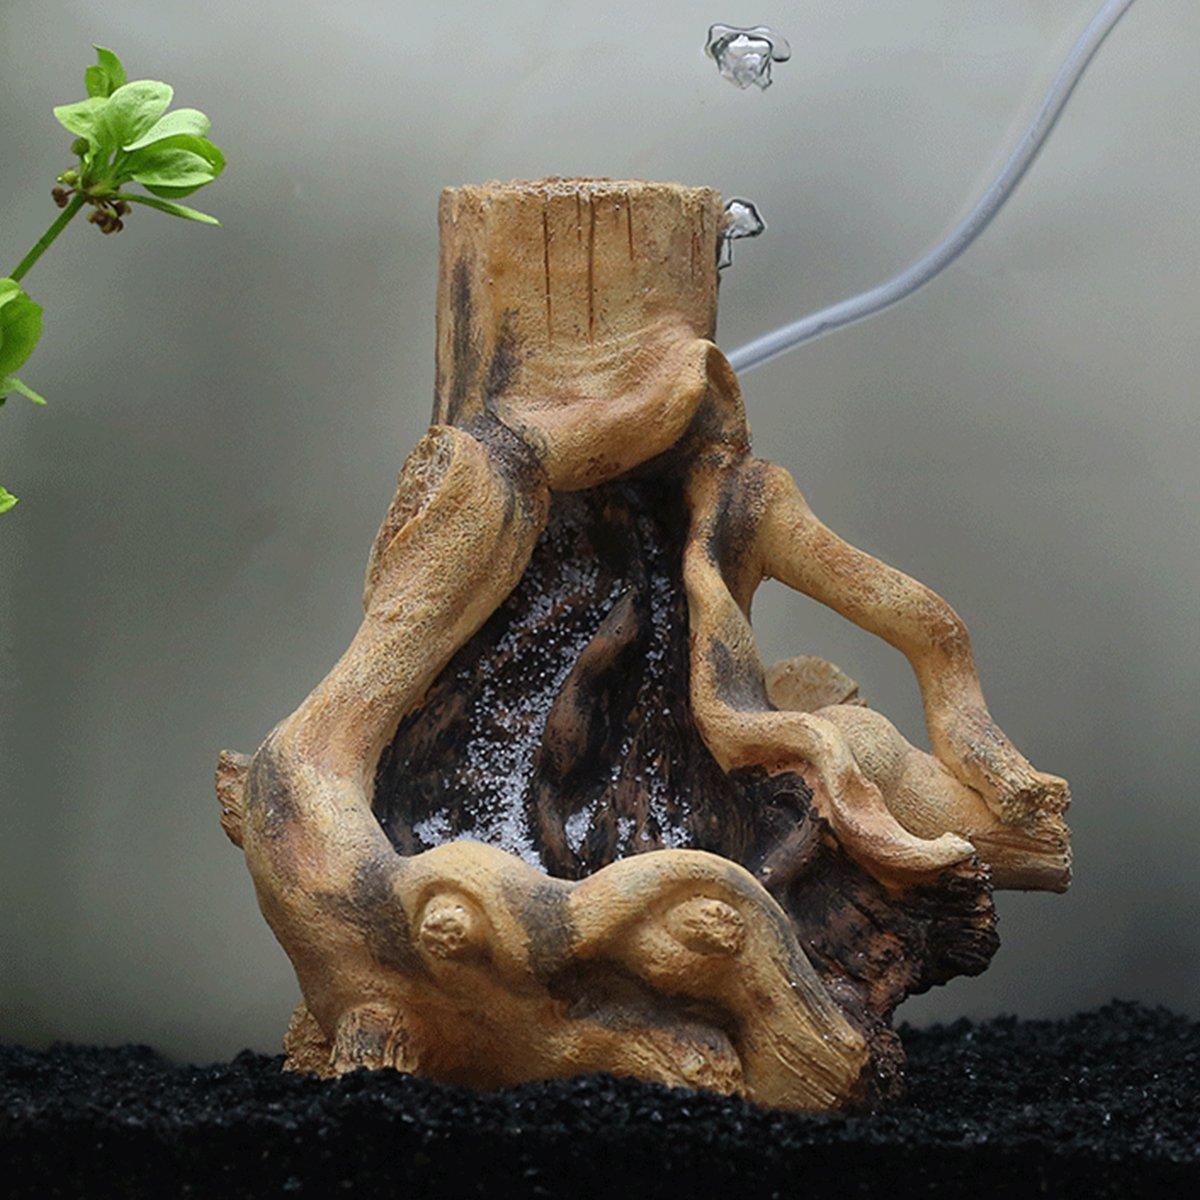 Saim Resin Stylish Driftwood Aquarium Fish Tank Terrarium Tree Root Plant Wood Decoration Quick Sand Landscape Ornament by Saim